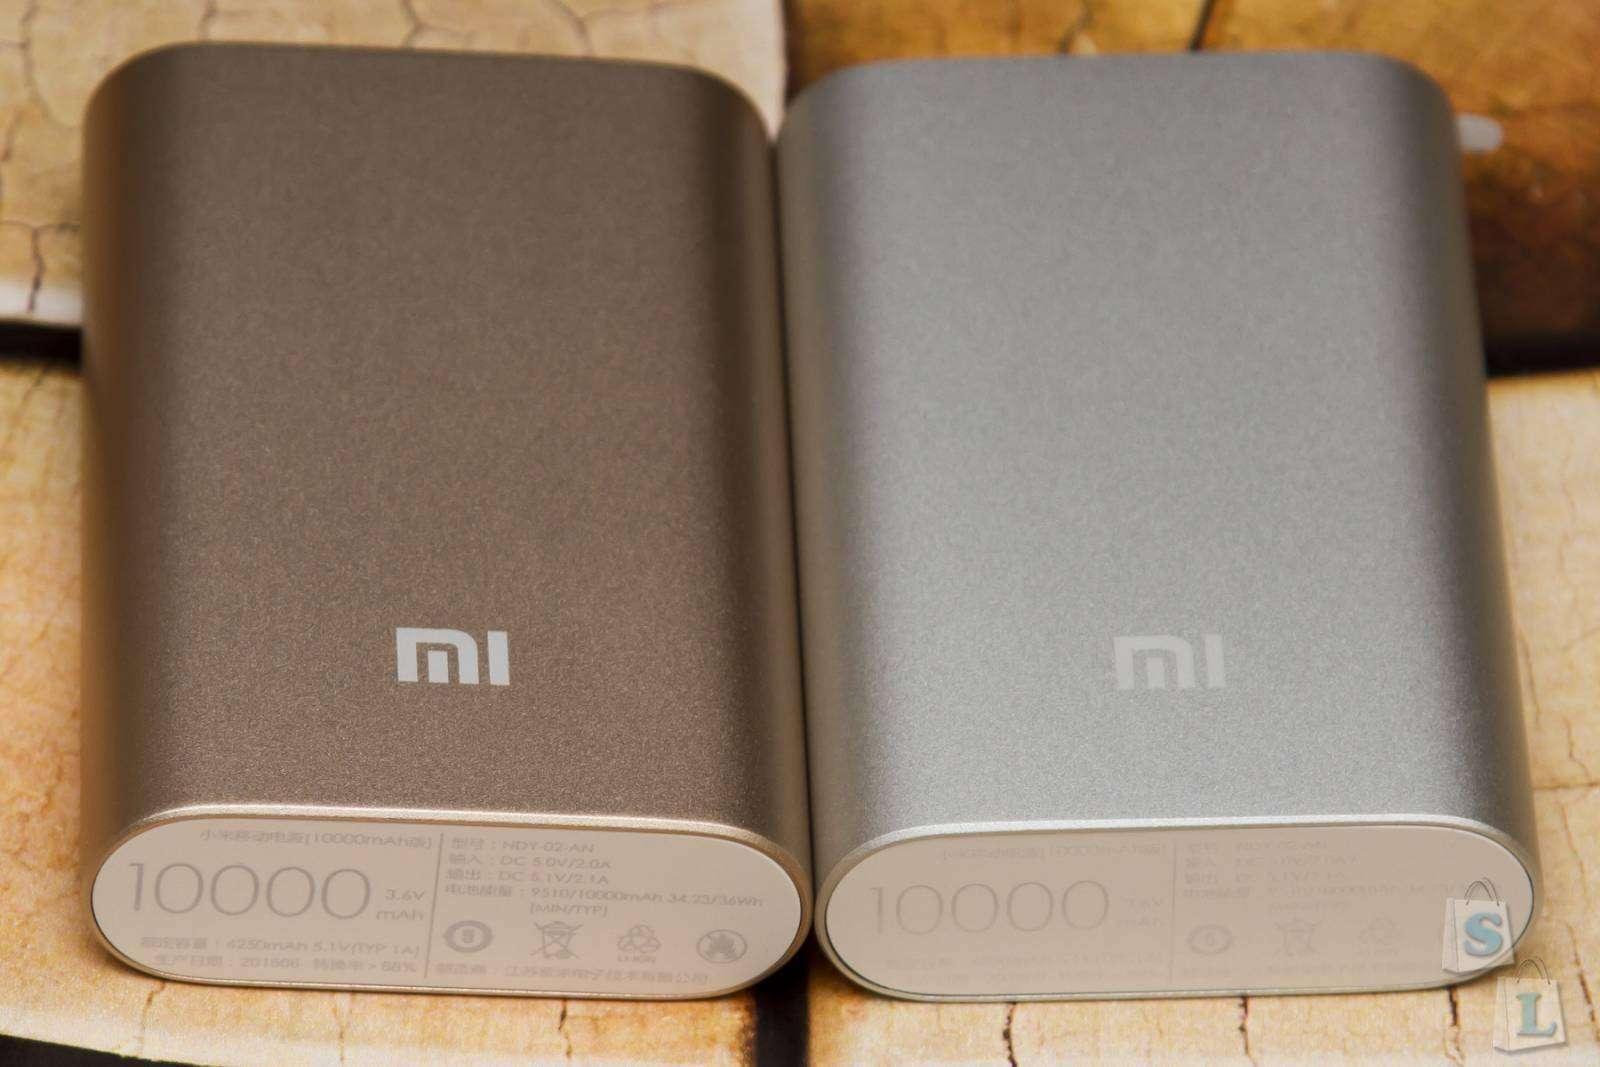 GearBest: Золотистый павербанк Xiaomi 10000mAh сравнение и тест мощности